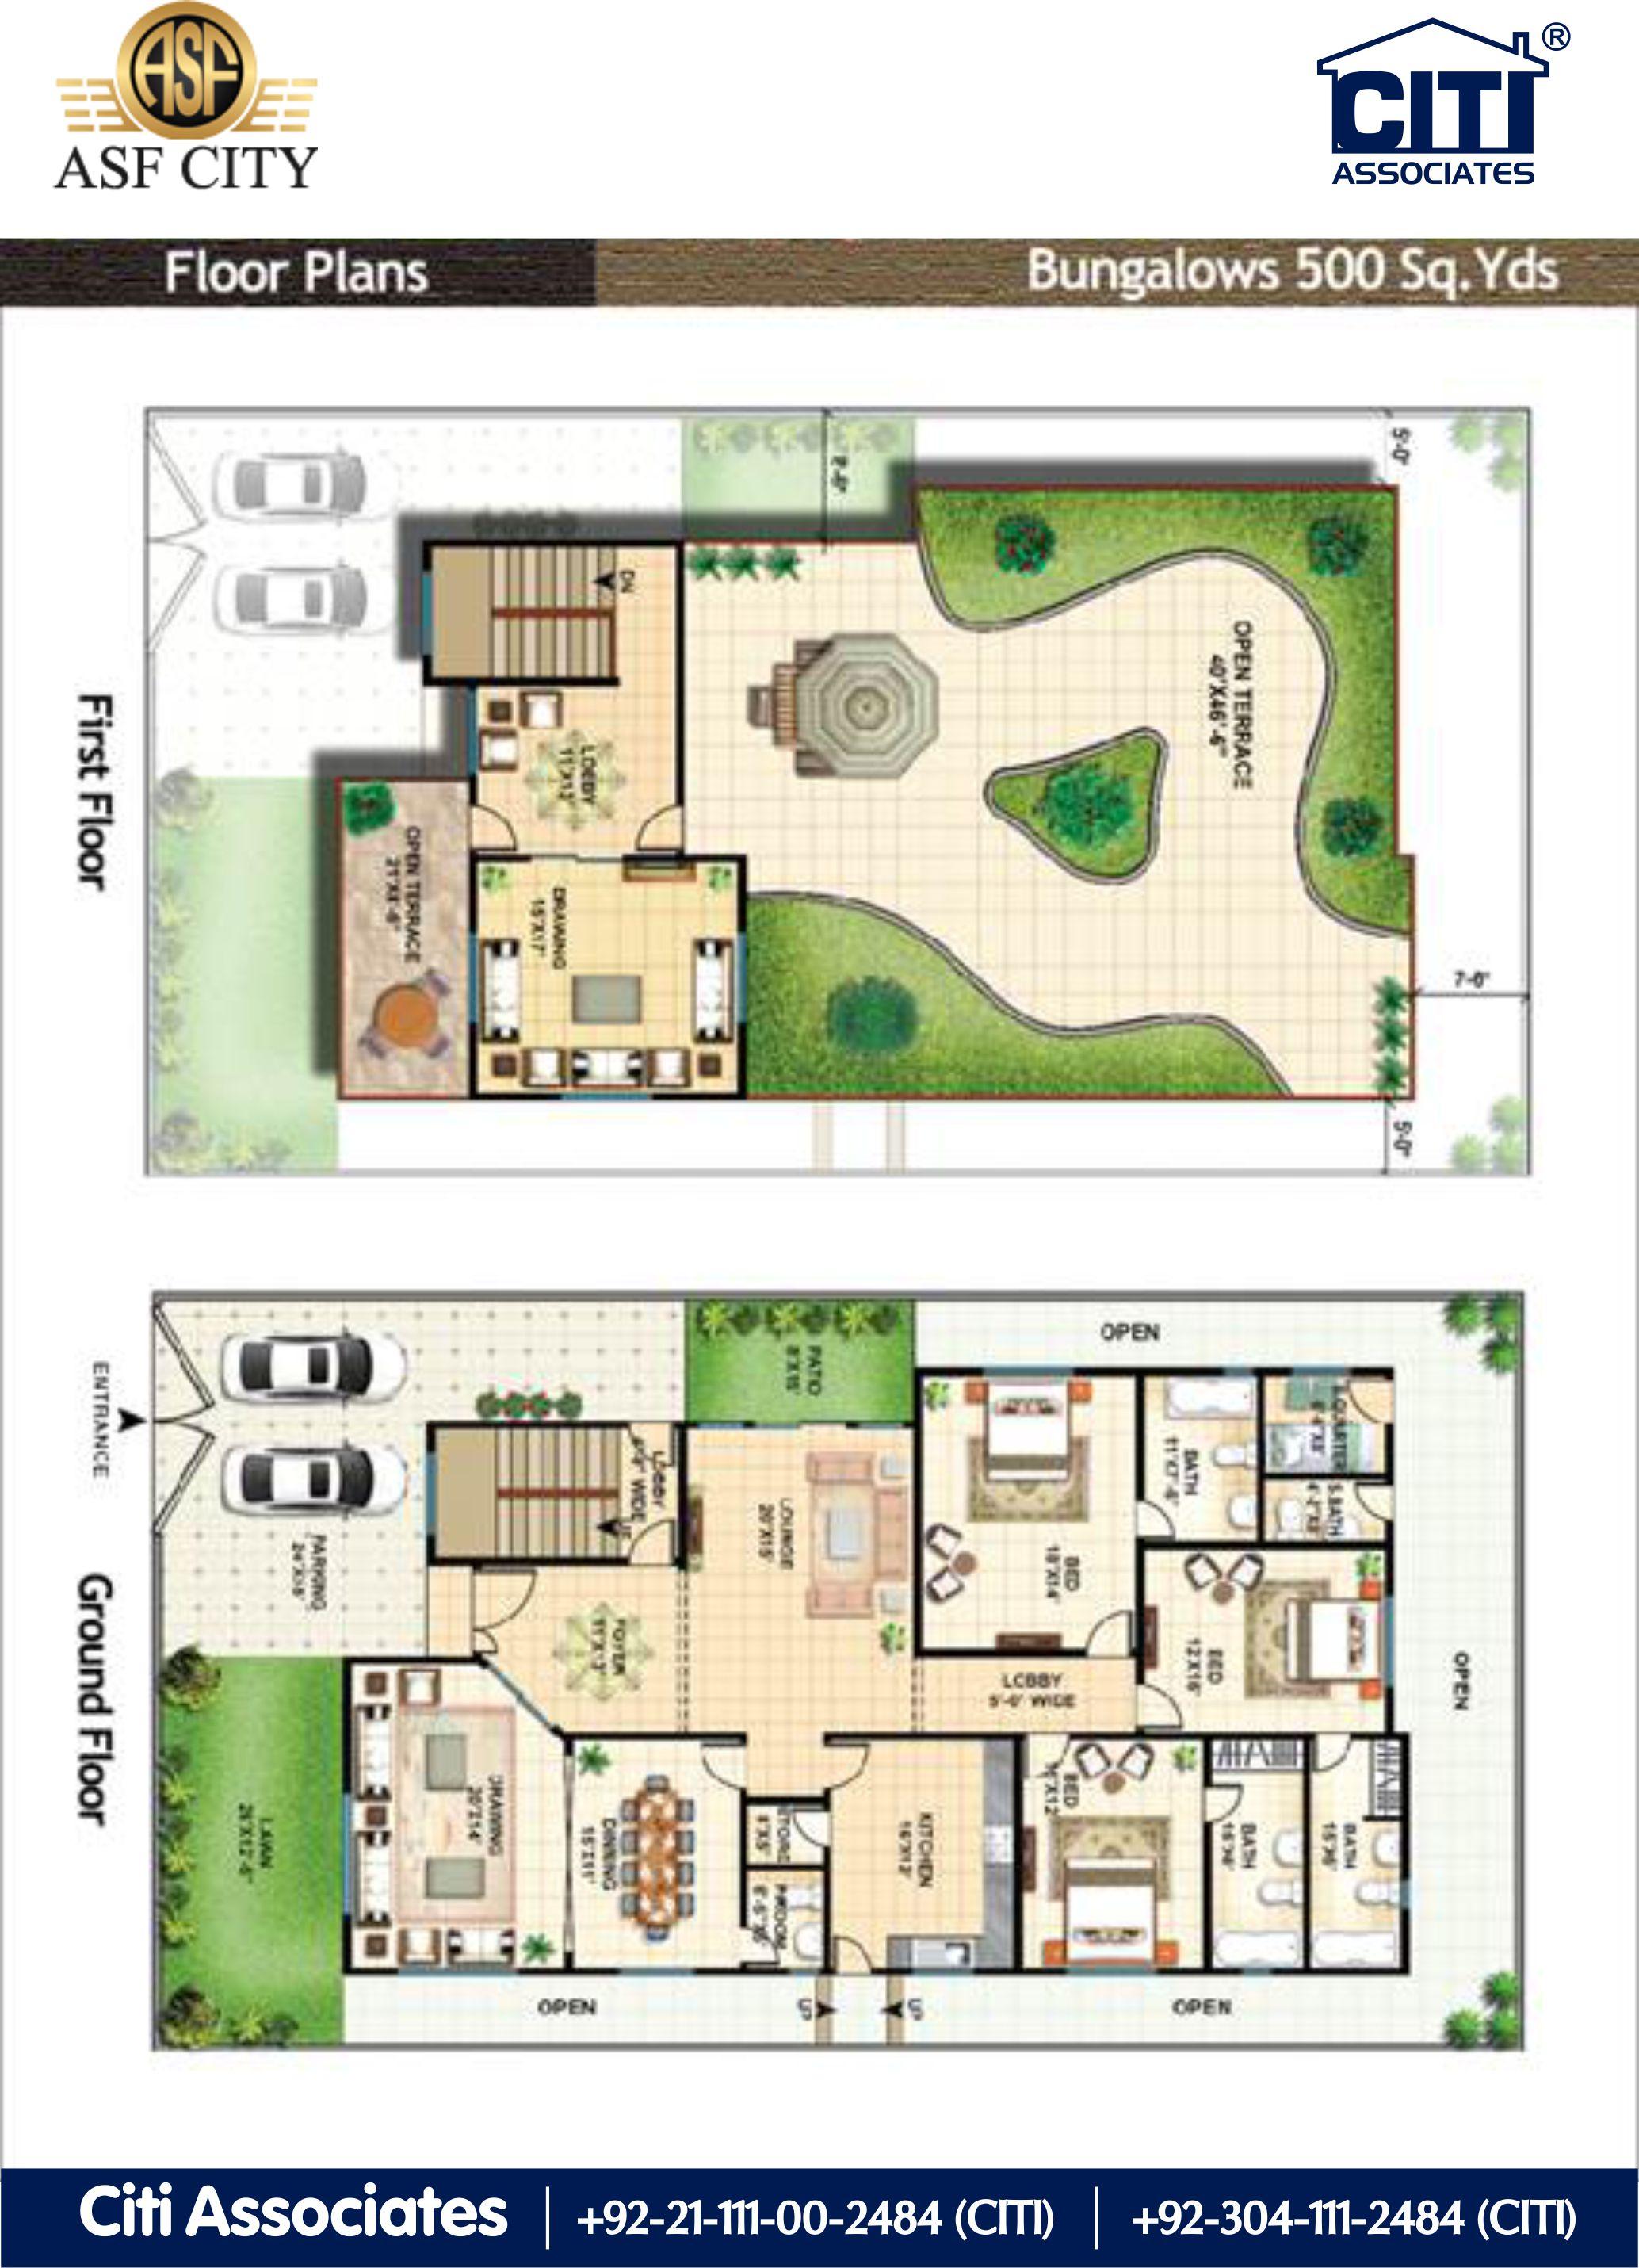 Asf City Karachi 500 Sqyds Bungalow Floor Plan Asf City